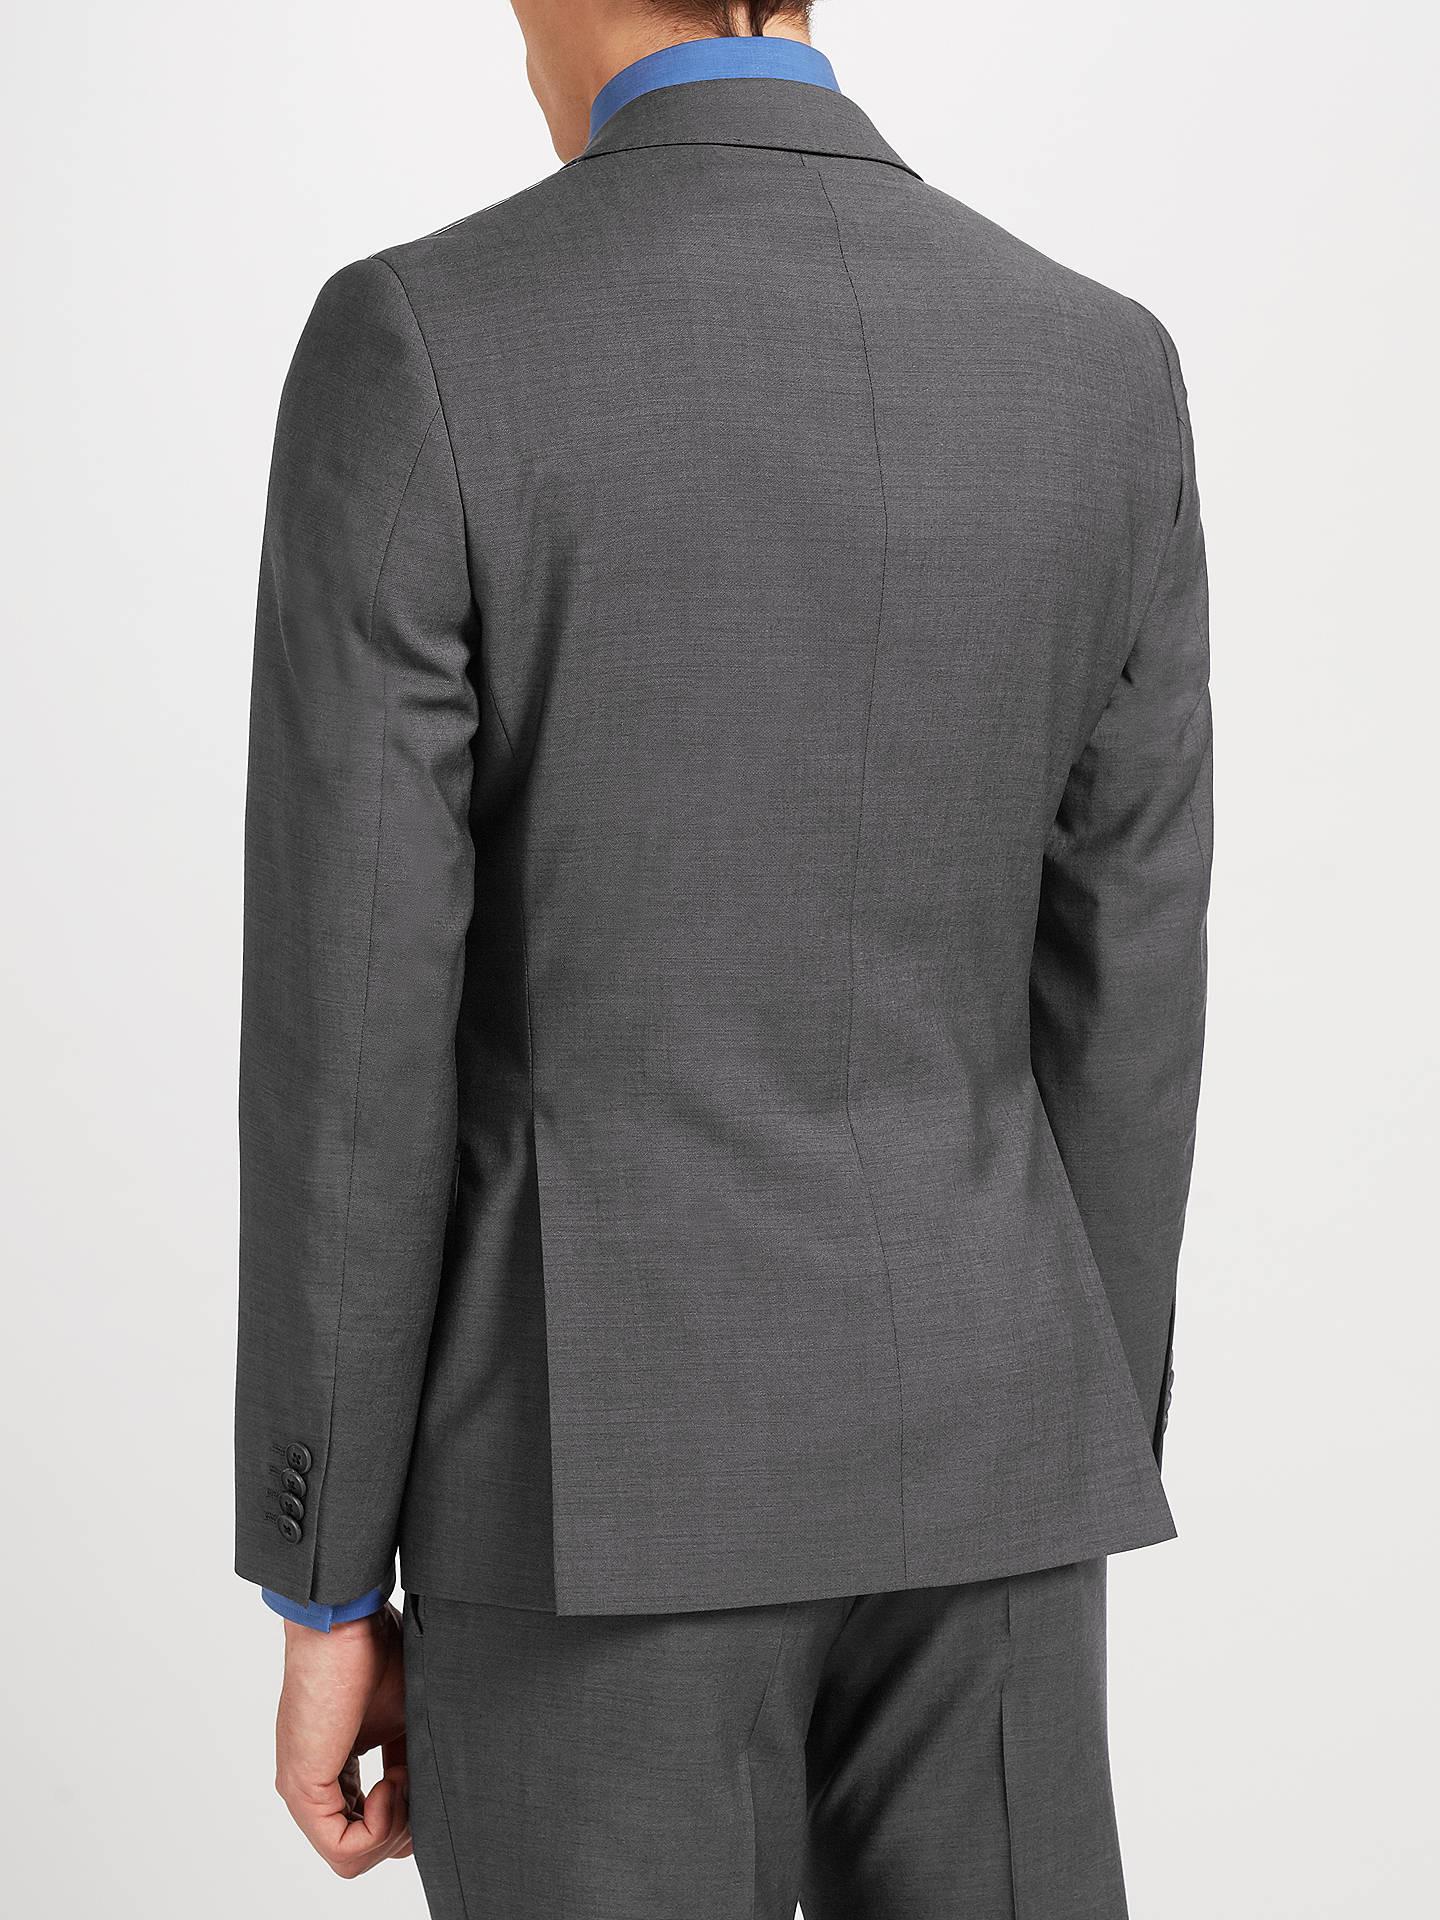 b9321957219 ... Buy Richard James Mayfair Tonic Sheen Slim Suit Jacket